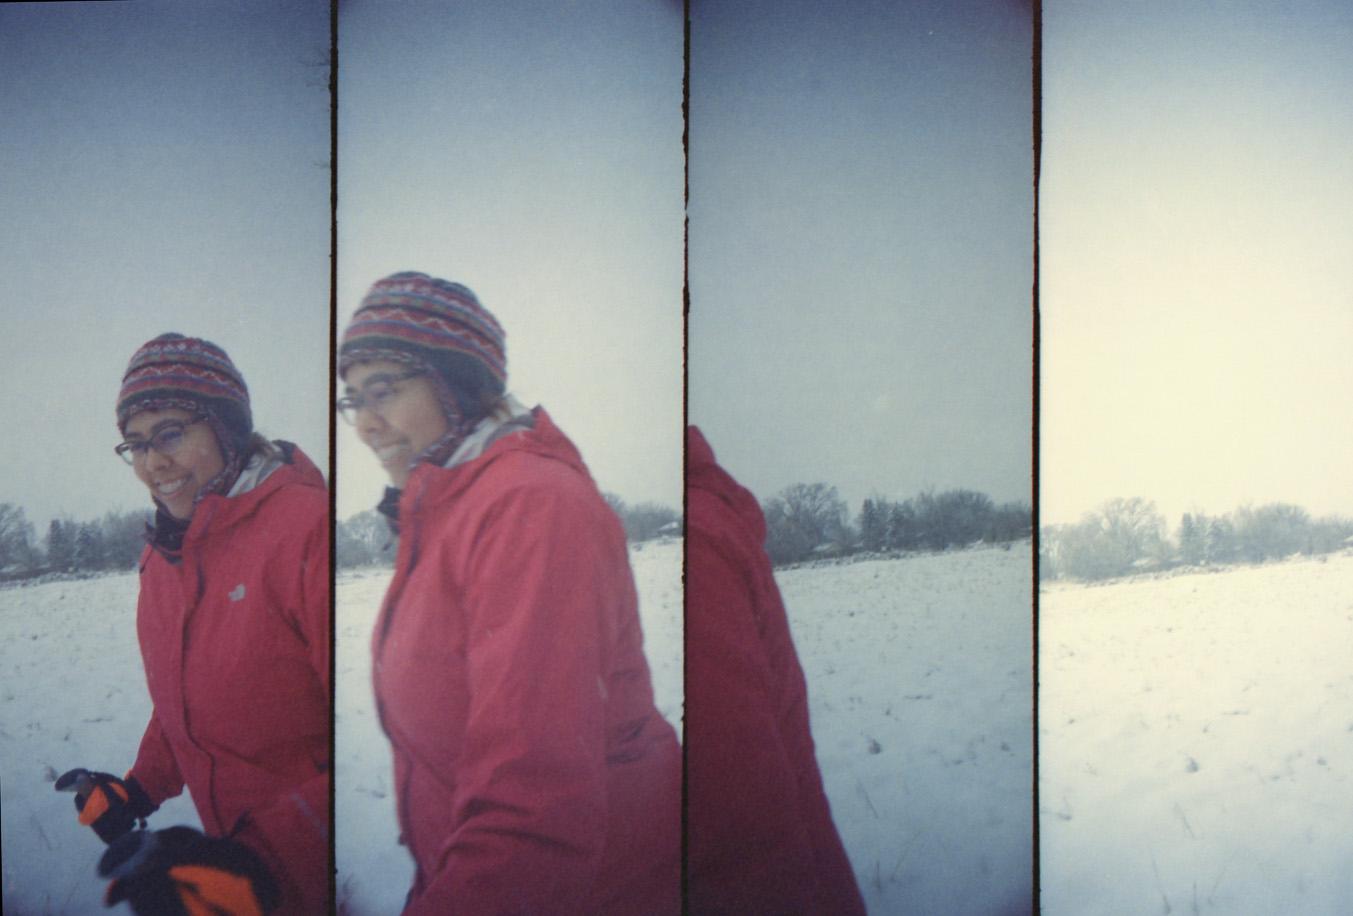 Snowshoe fun!